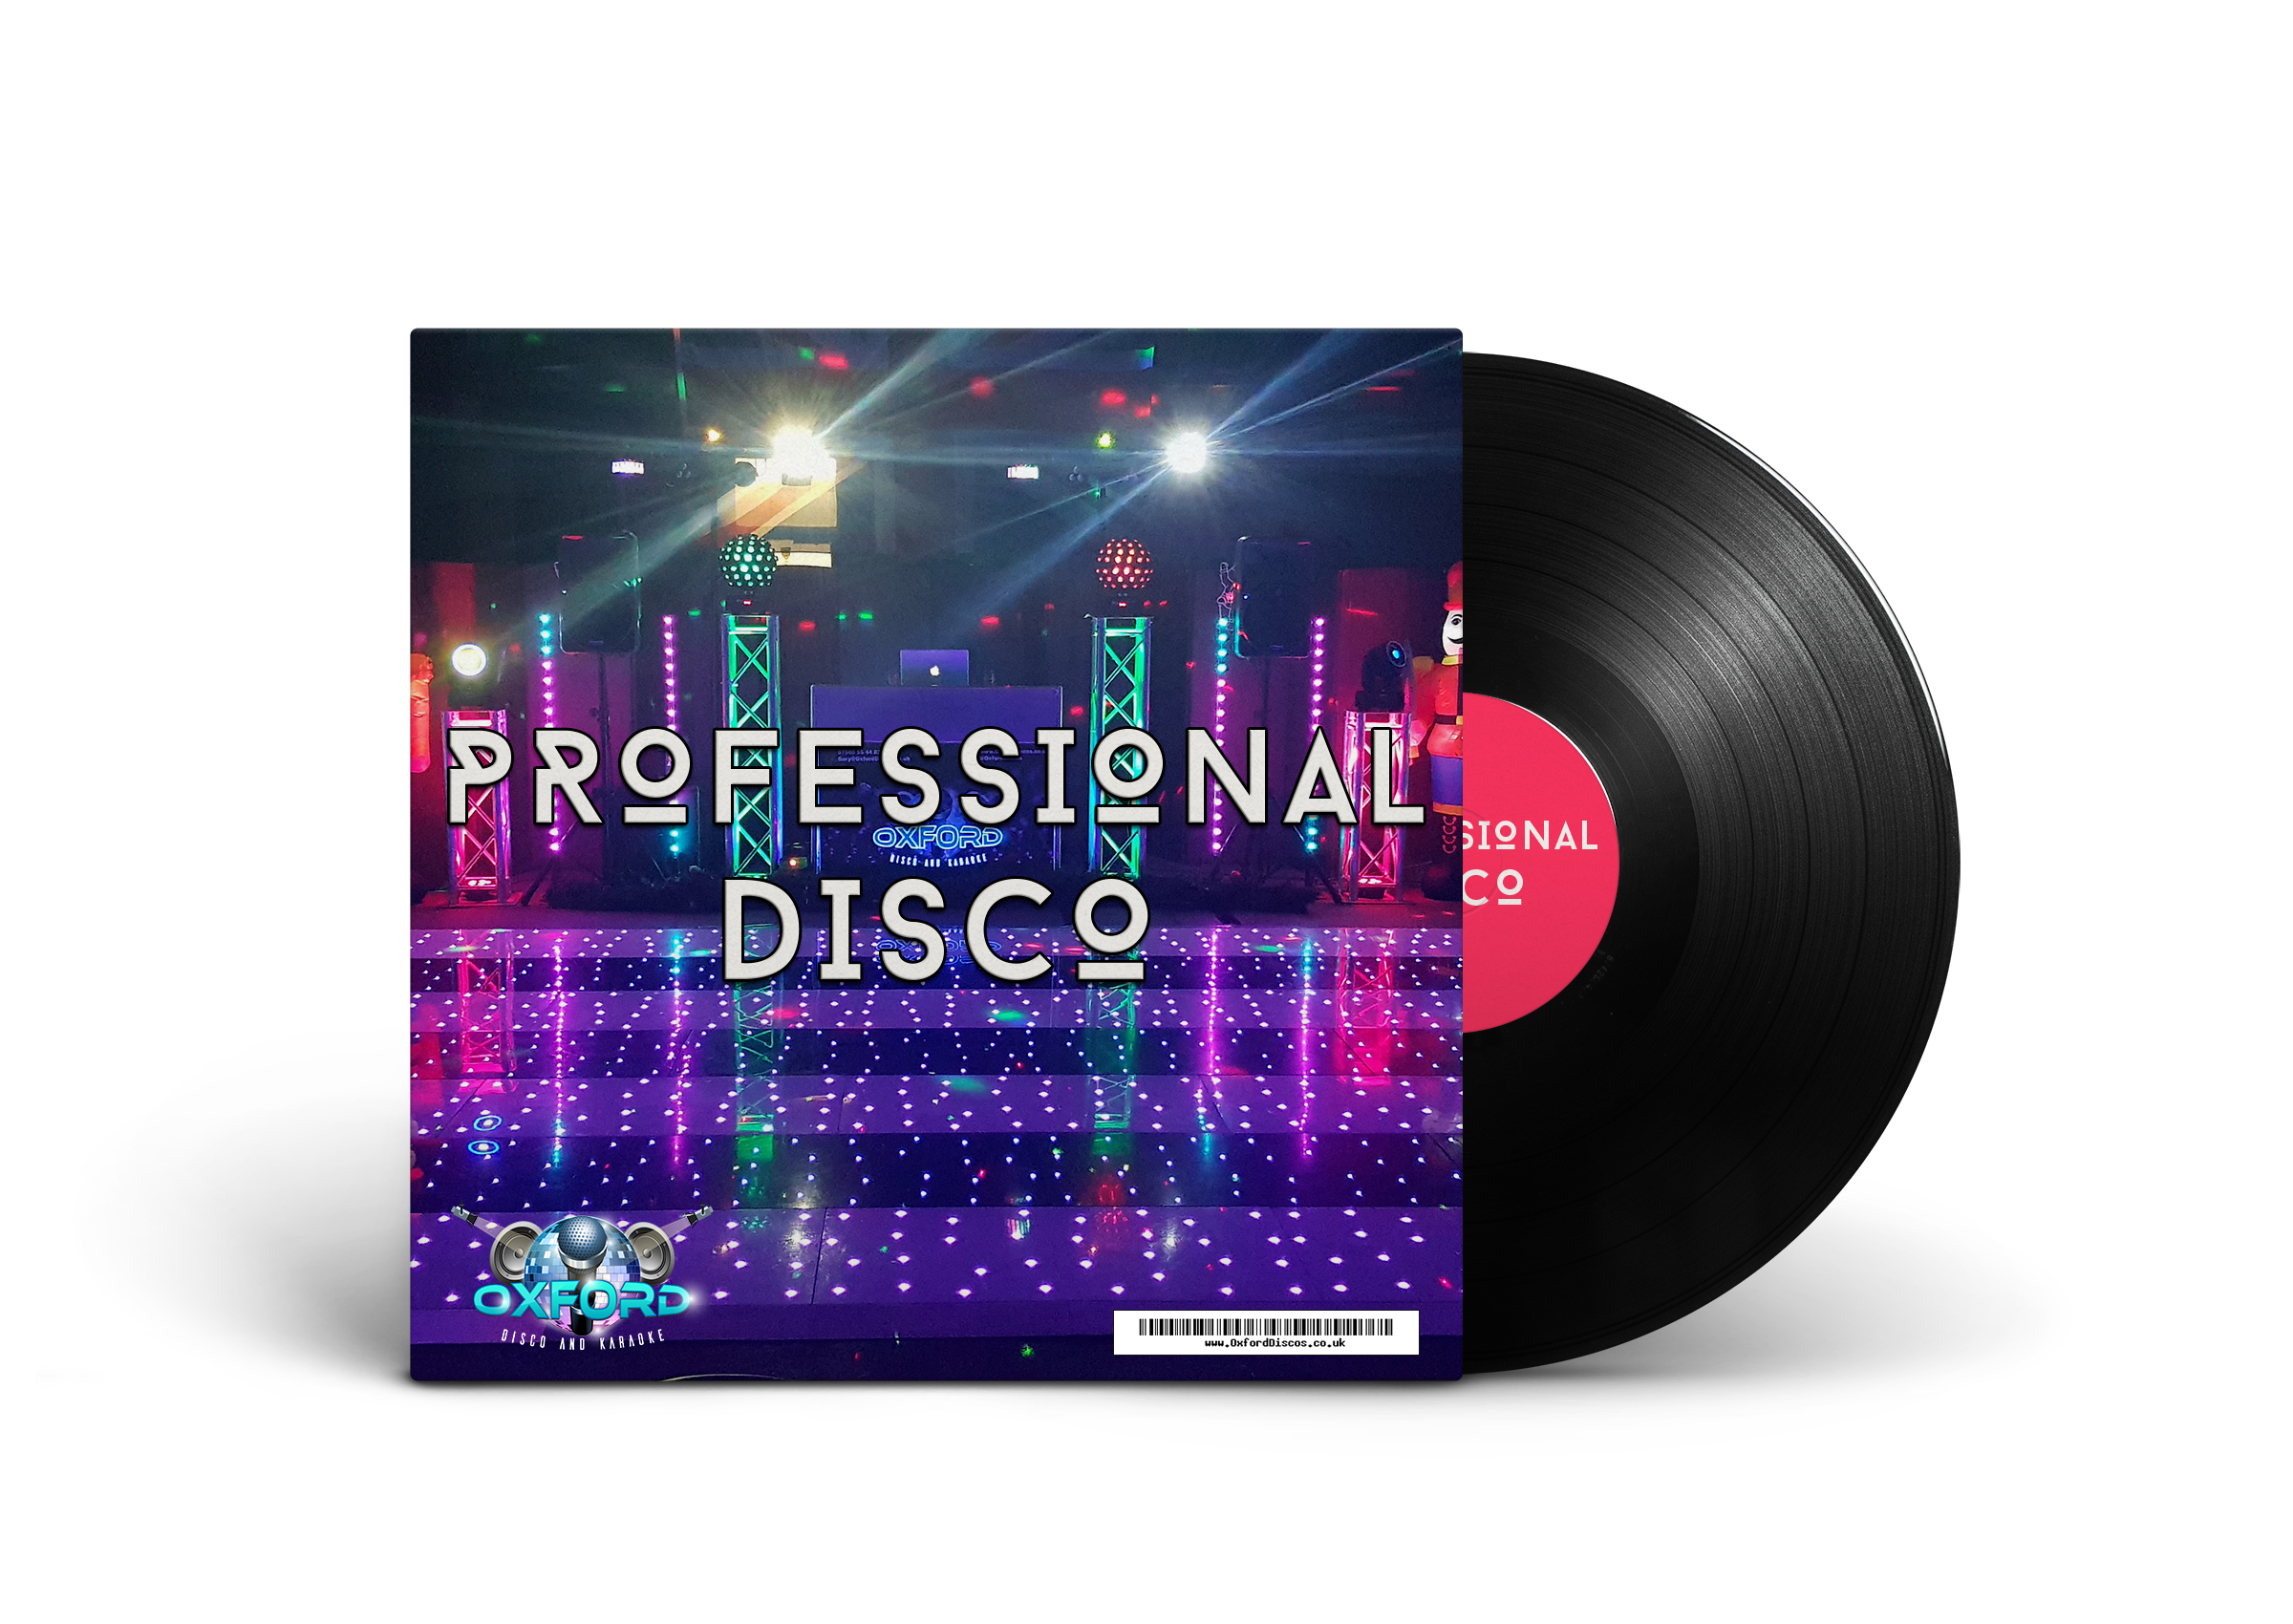 Oxford Disco and Karaoke Professional Disco